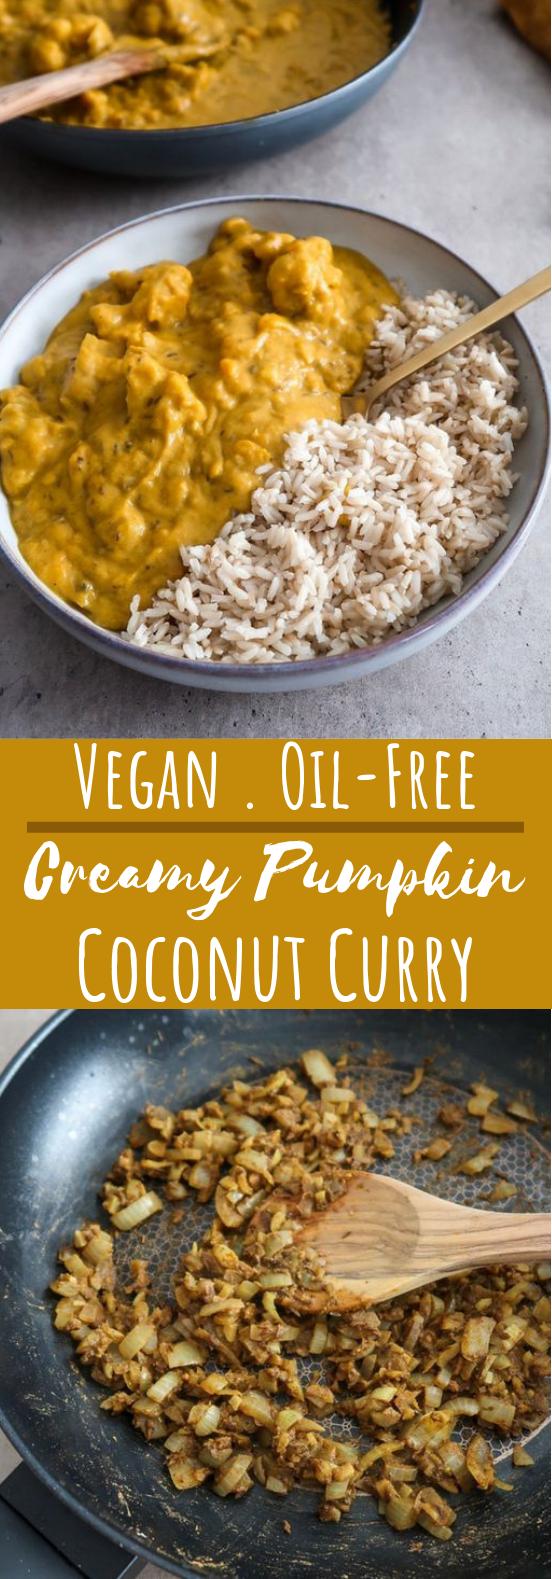 Pumpkin Coconut Curry #vegetarian #vegan #insurancequotes